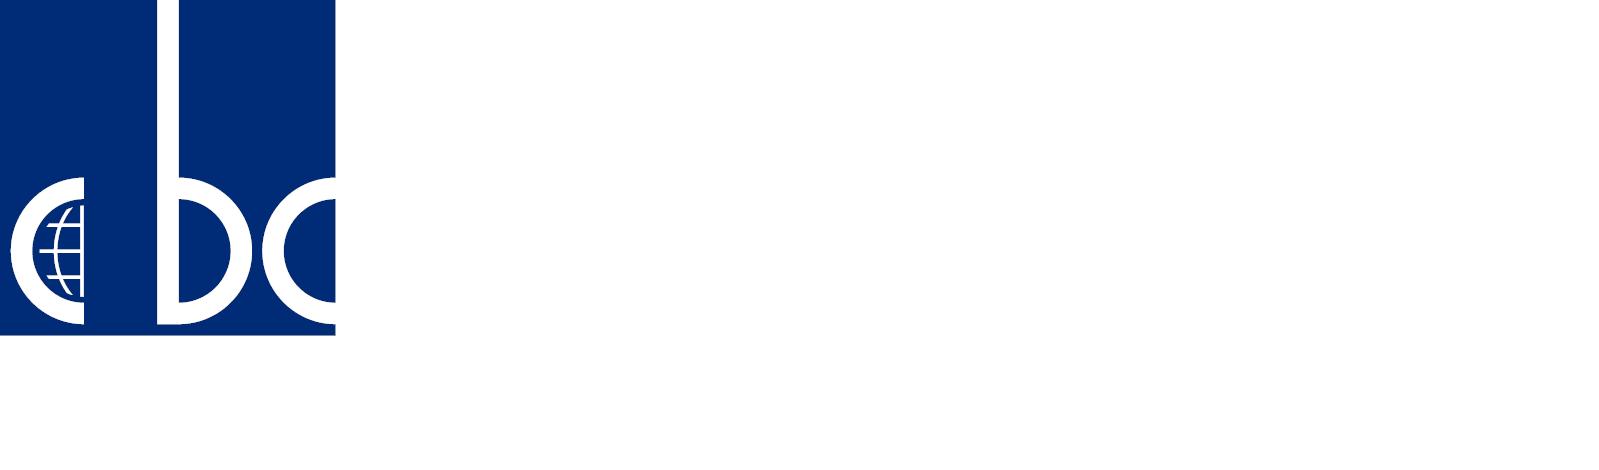 Banchero costa insurance broker